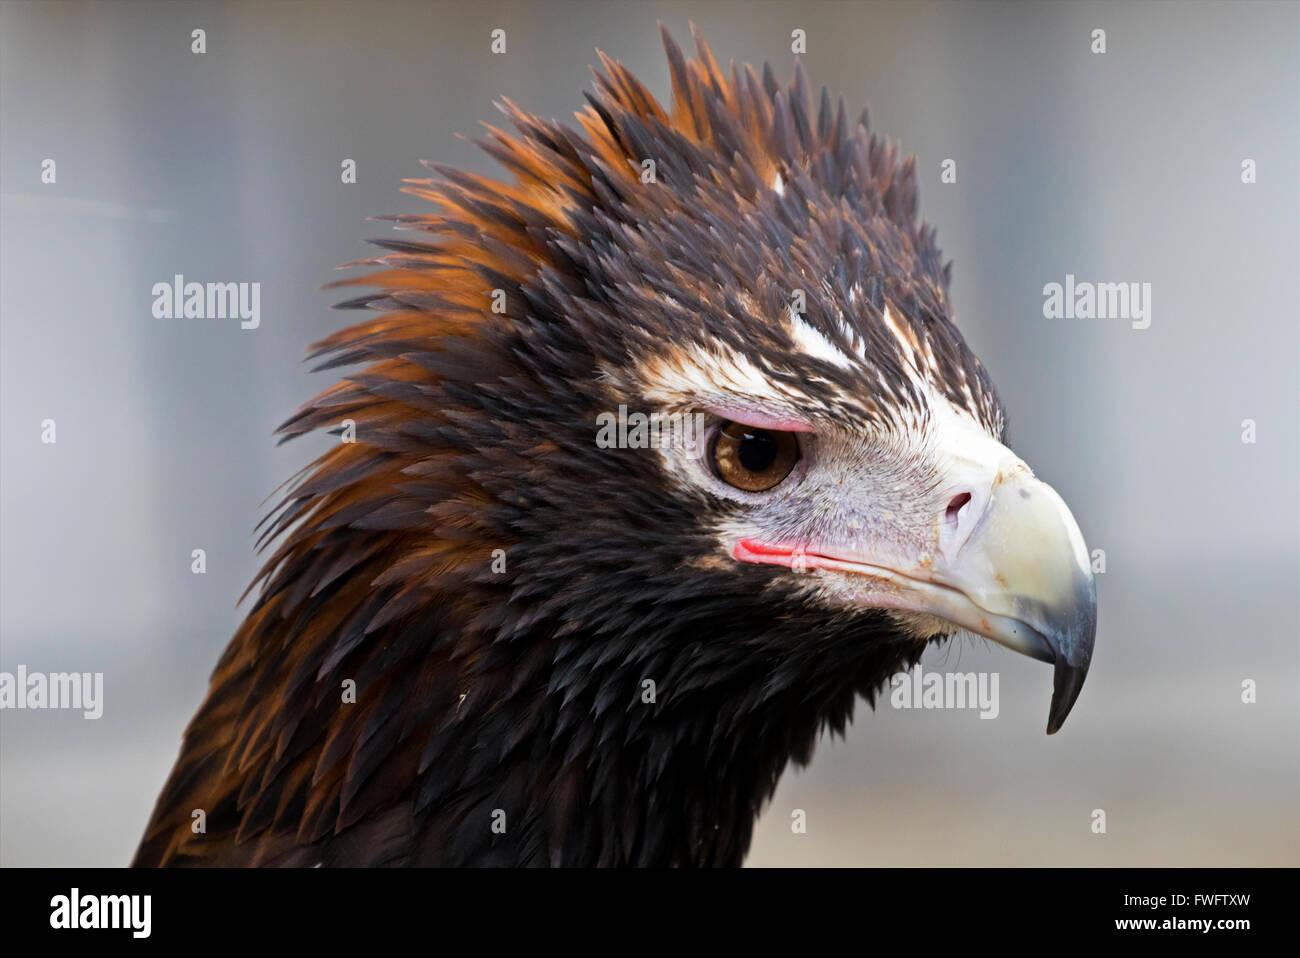 wedge tailed eagle - Stock Image